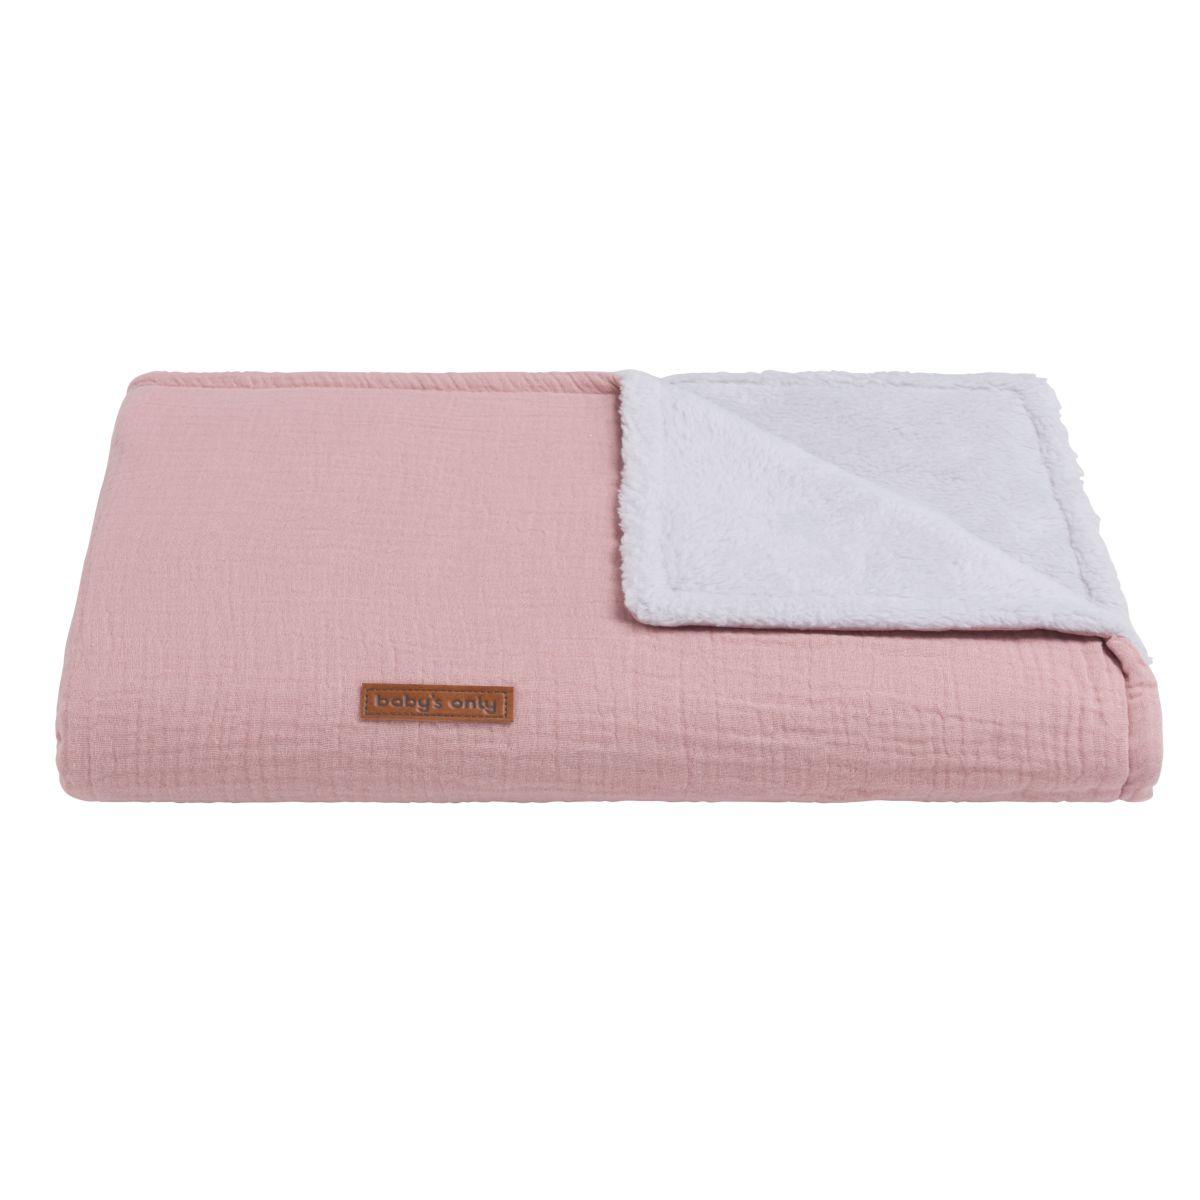 babys only 0231121 ledikantdeken teddy breeze baby roze 2